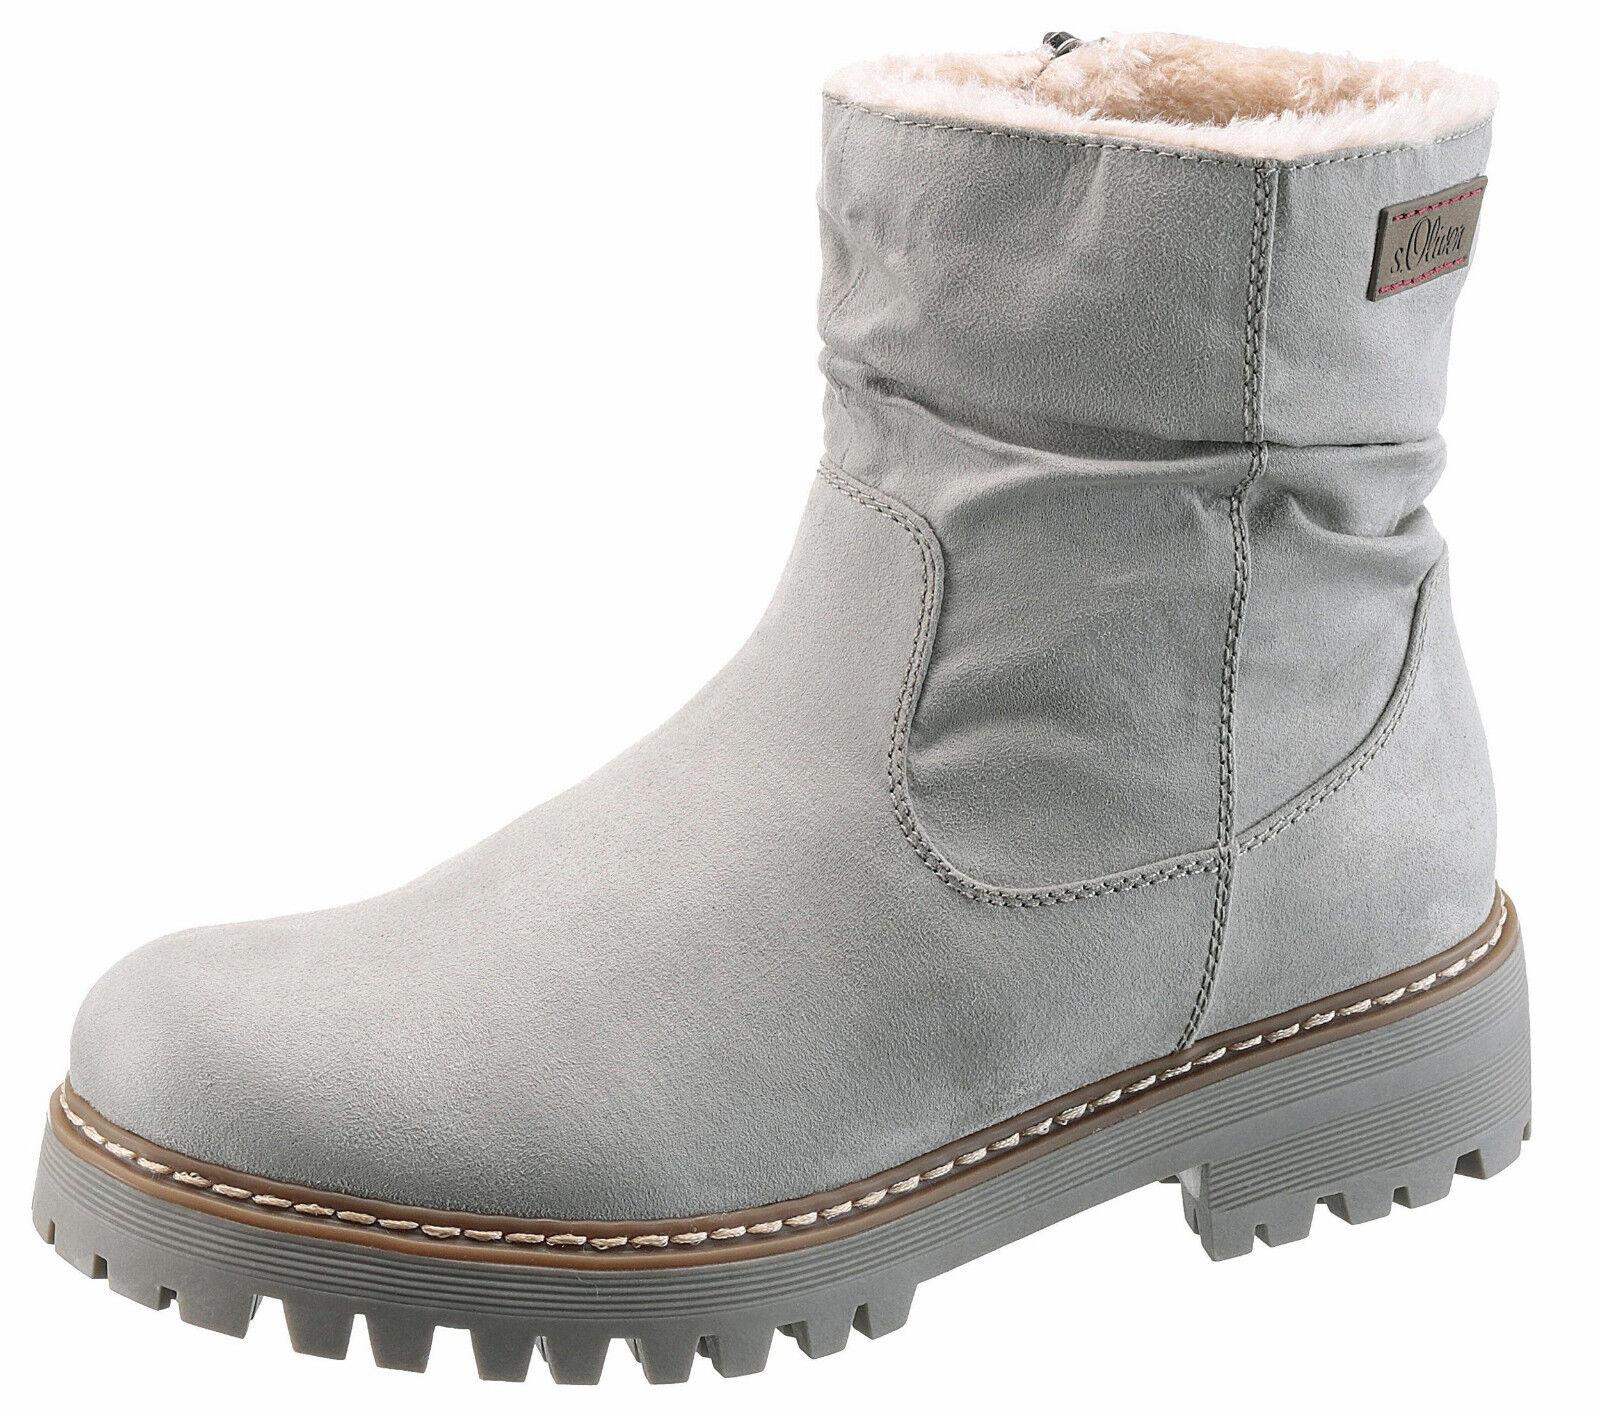 Soliver rouge LABEL Hiver bottes Bottes D'hiver Bottes Chaussures Femmes Taille 40